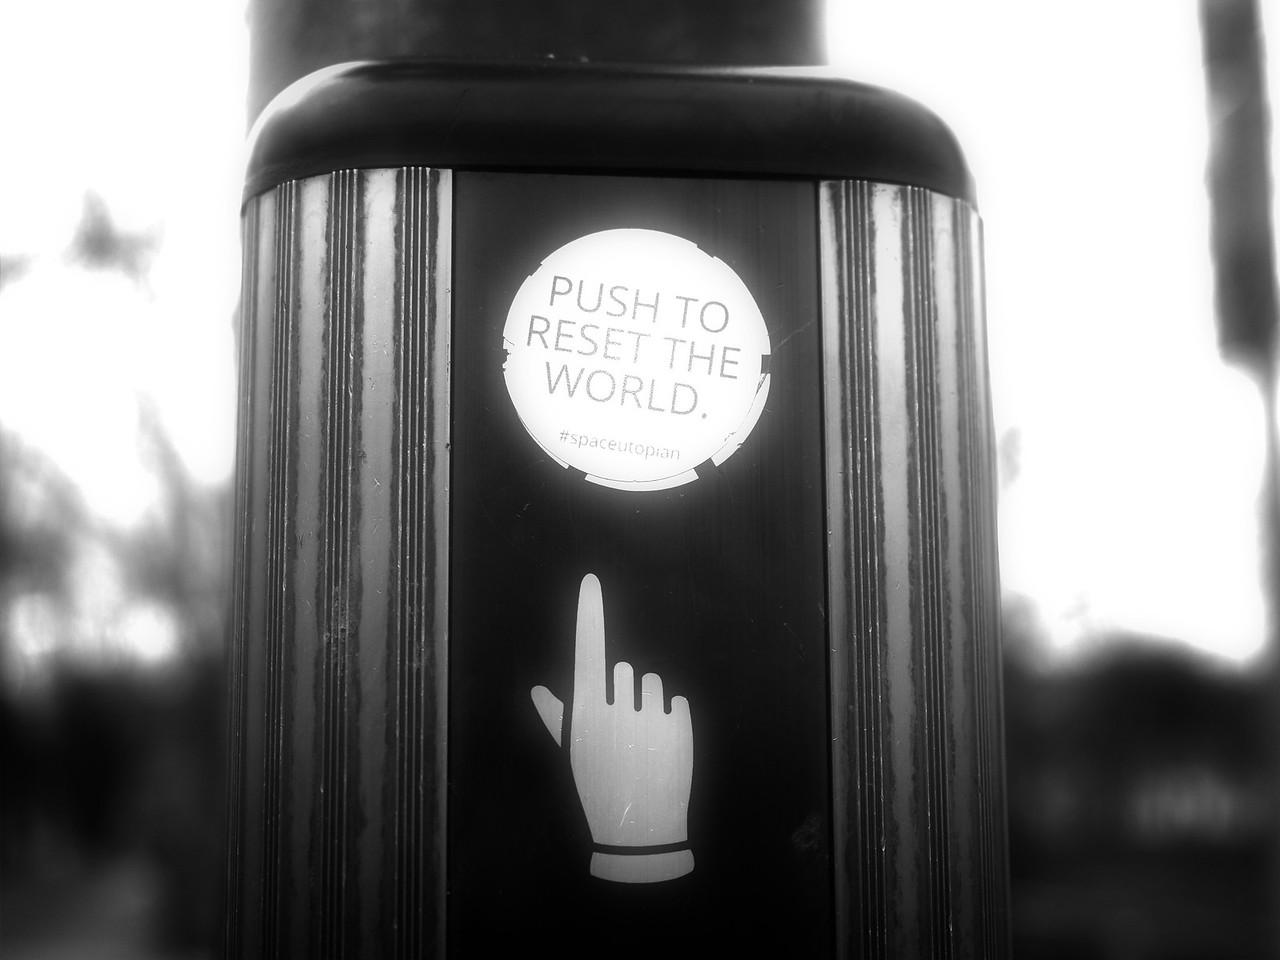 Push to Reset the World